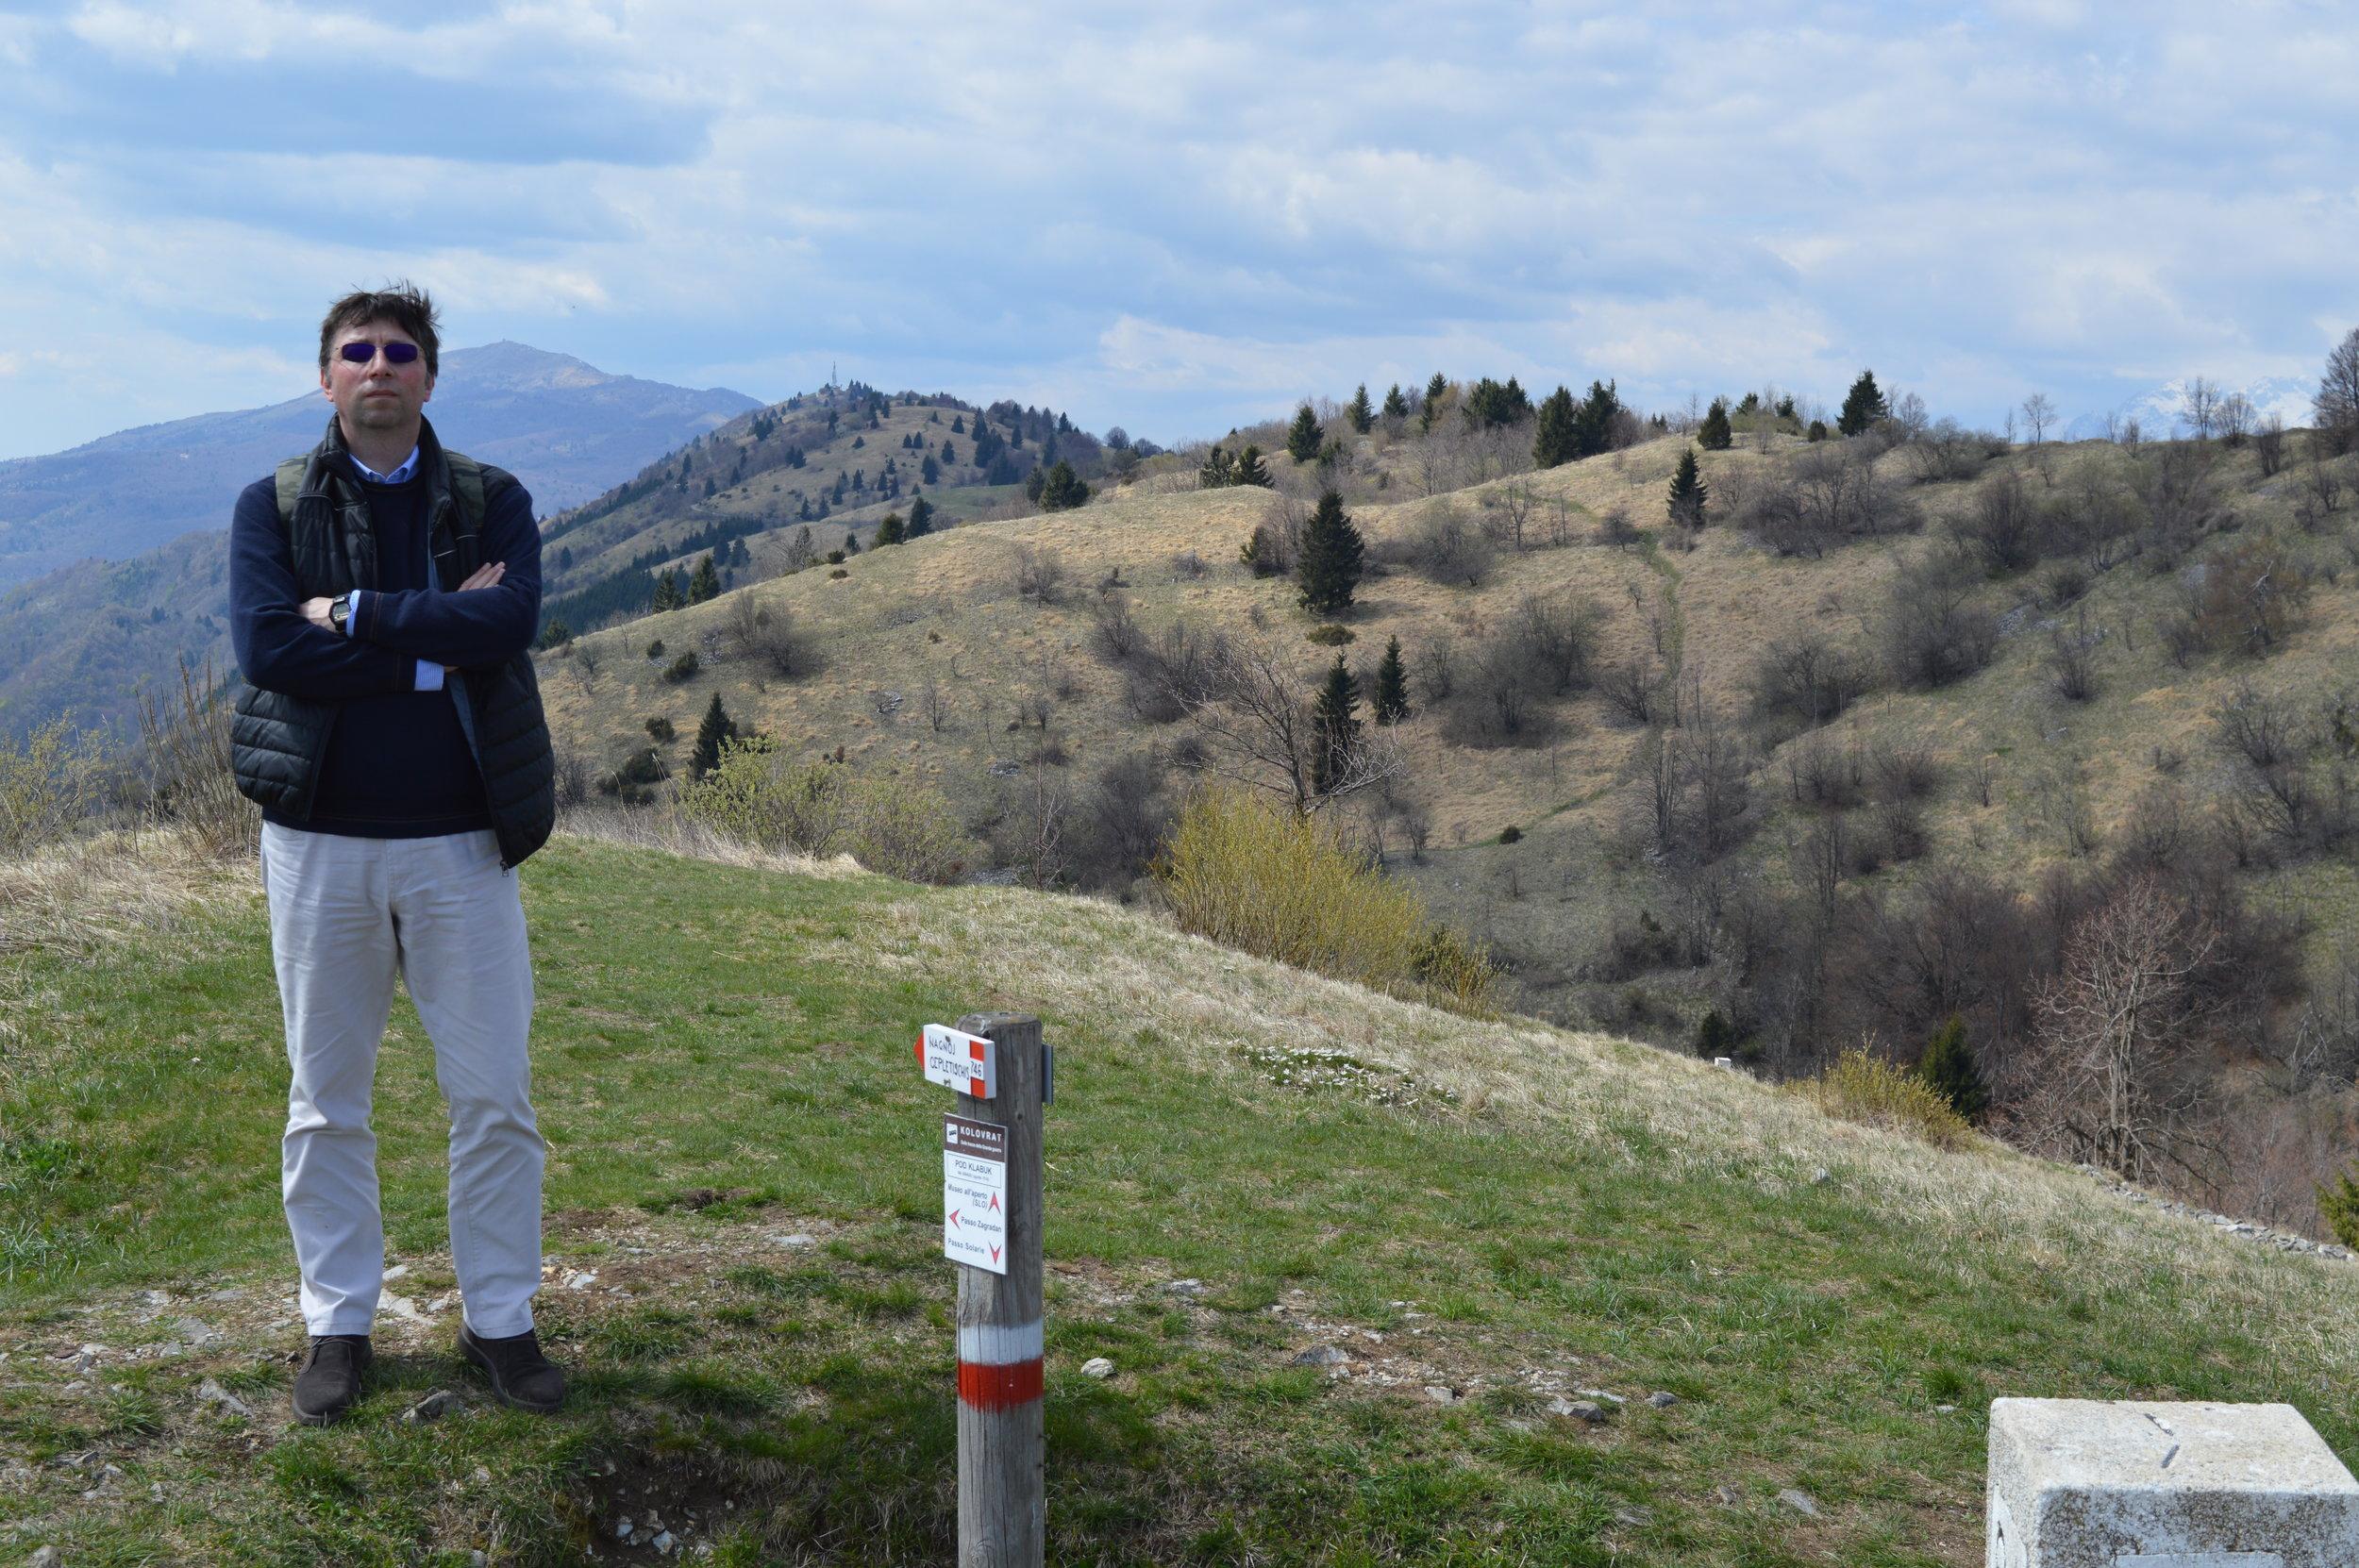 Podkabluc (Kolovrat), sullo sfondo il M. Kuk e il Matajur - confine sloveno, 18 aprile 2019